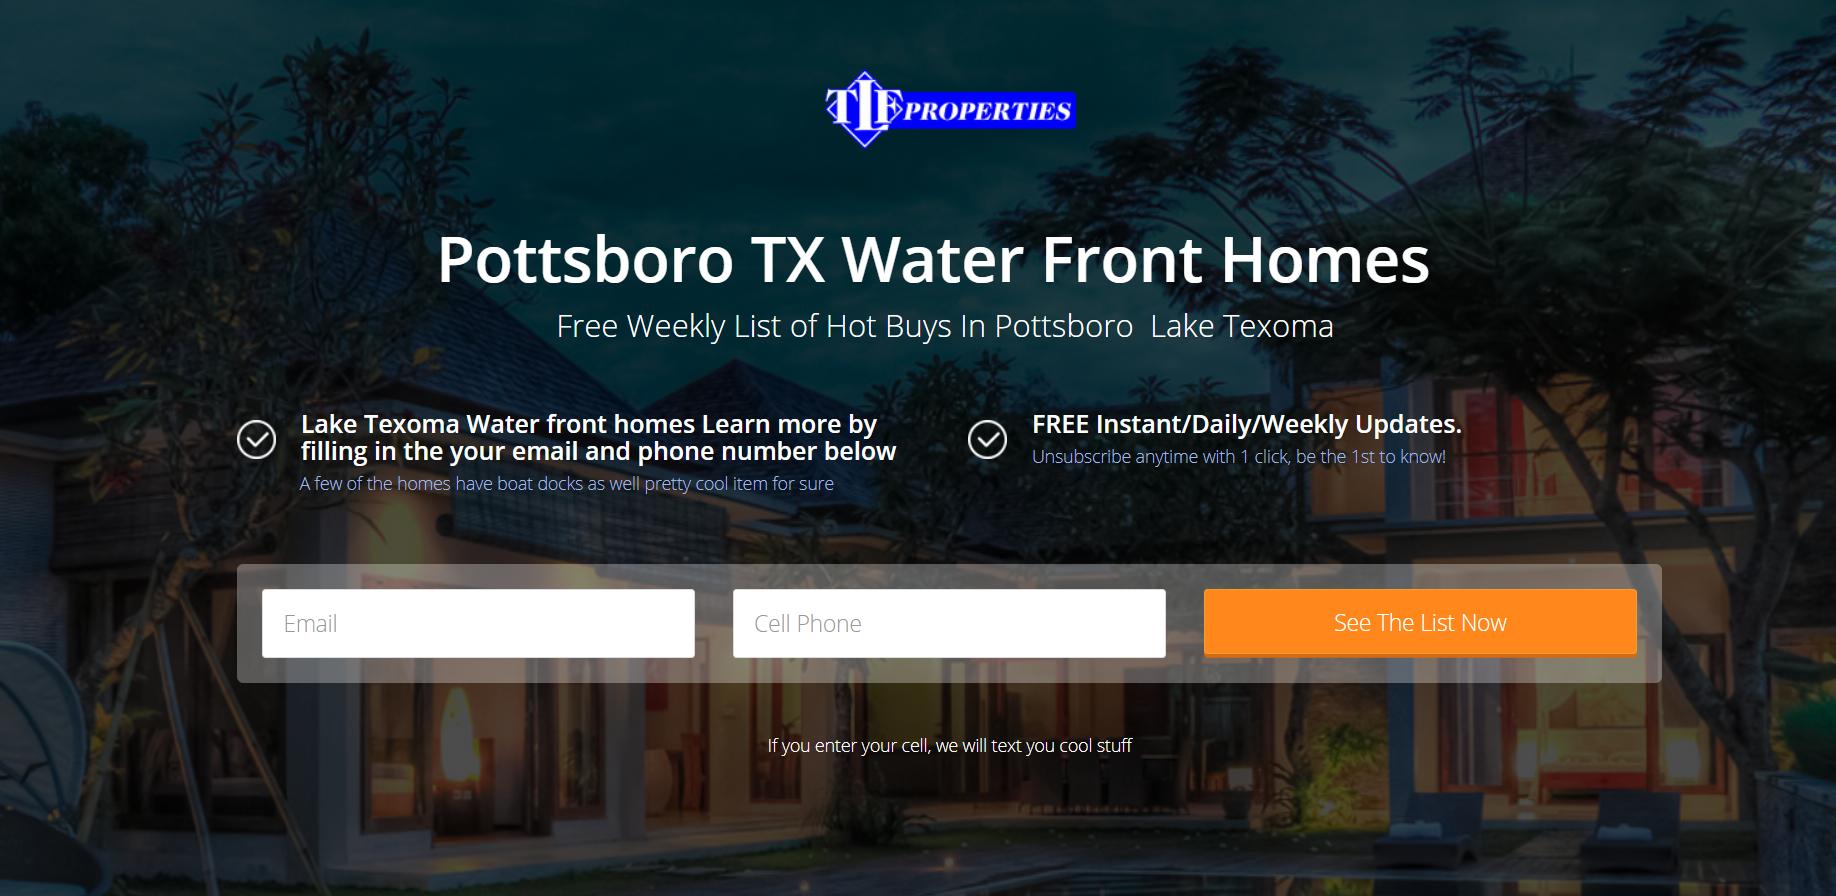 Tremendous Water Front Homes Lake Texoma Pottsboro Tx Download Free Architecture Designs Remcamadebymaigaardcom